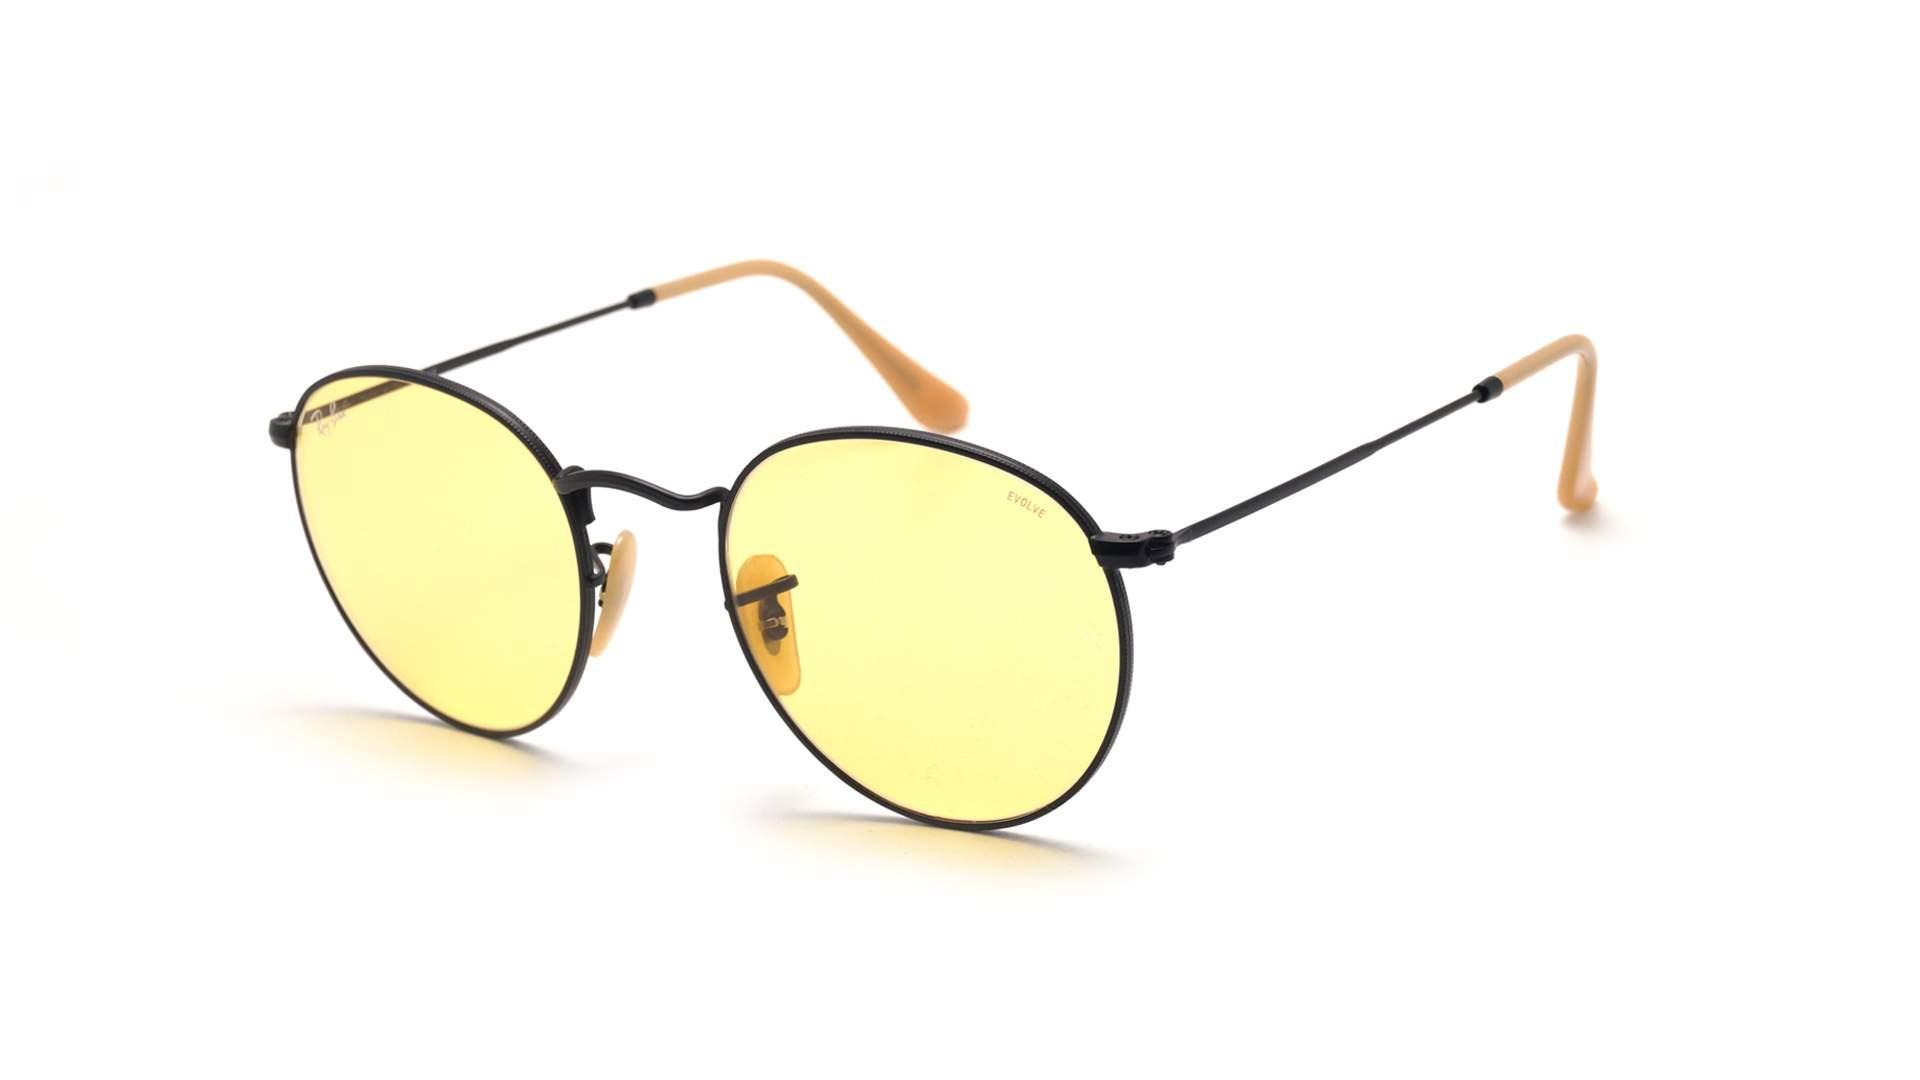 f89a9638a4e Sunglasses Ray-Ban Round Evolve Black Matte RB3447 9066 4A 50-21 Medium  Photochromic